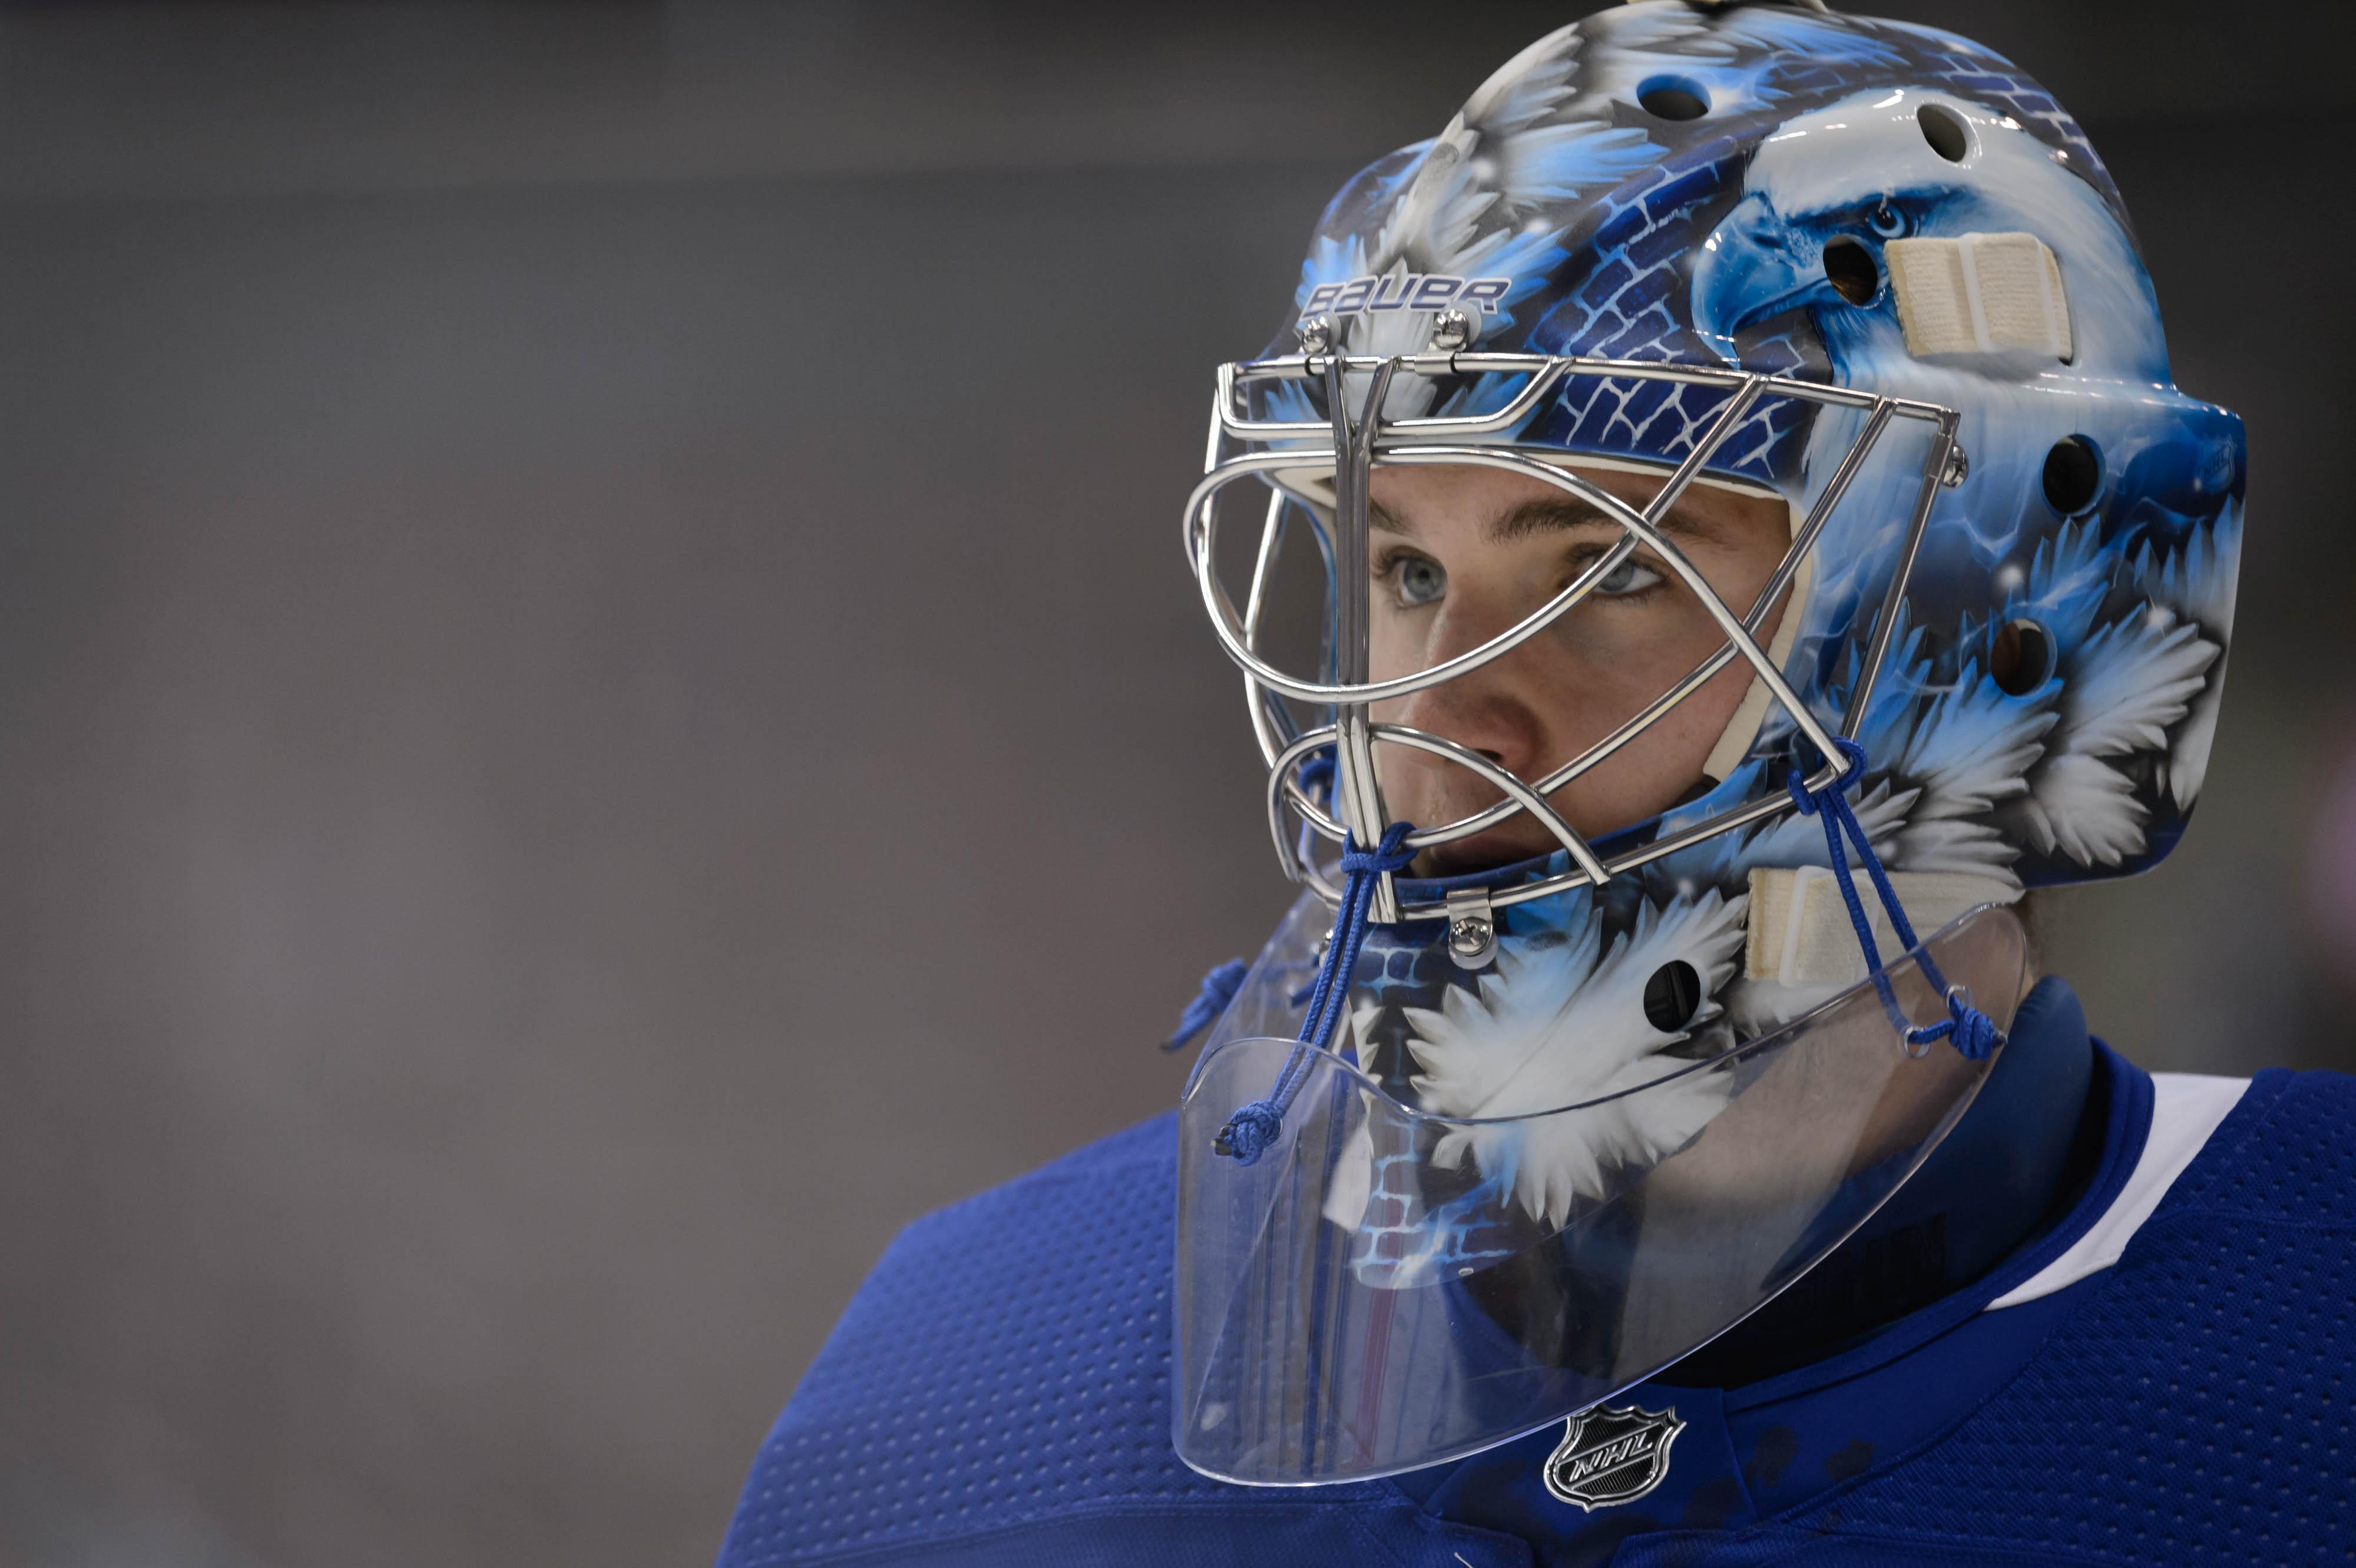 NHL: SEP 25 Preseason - Canadiens at Maple Leafs